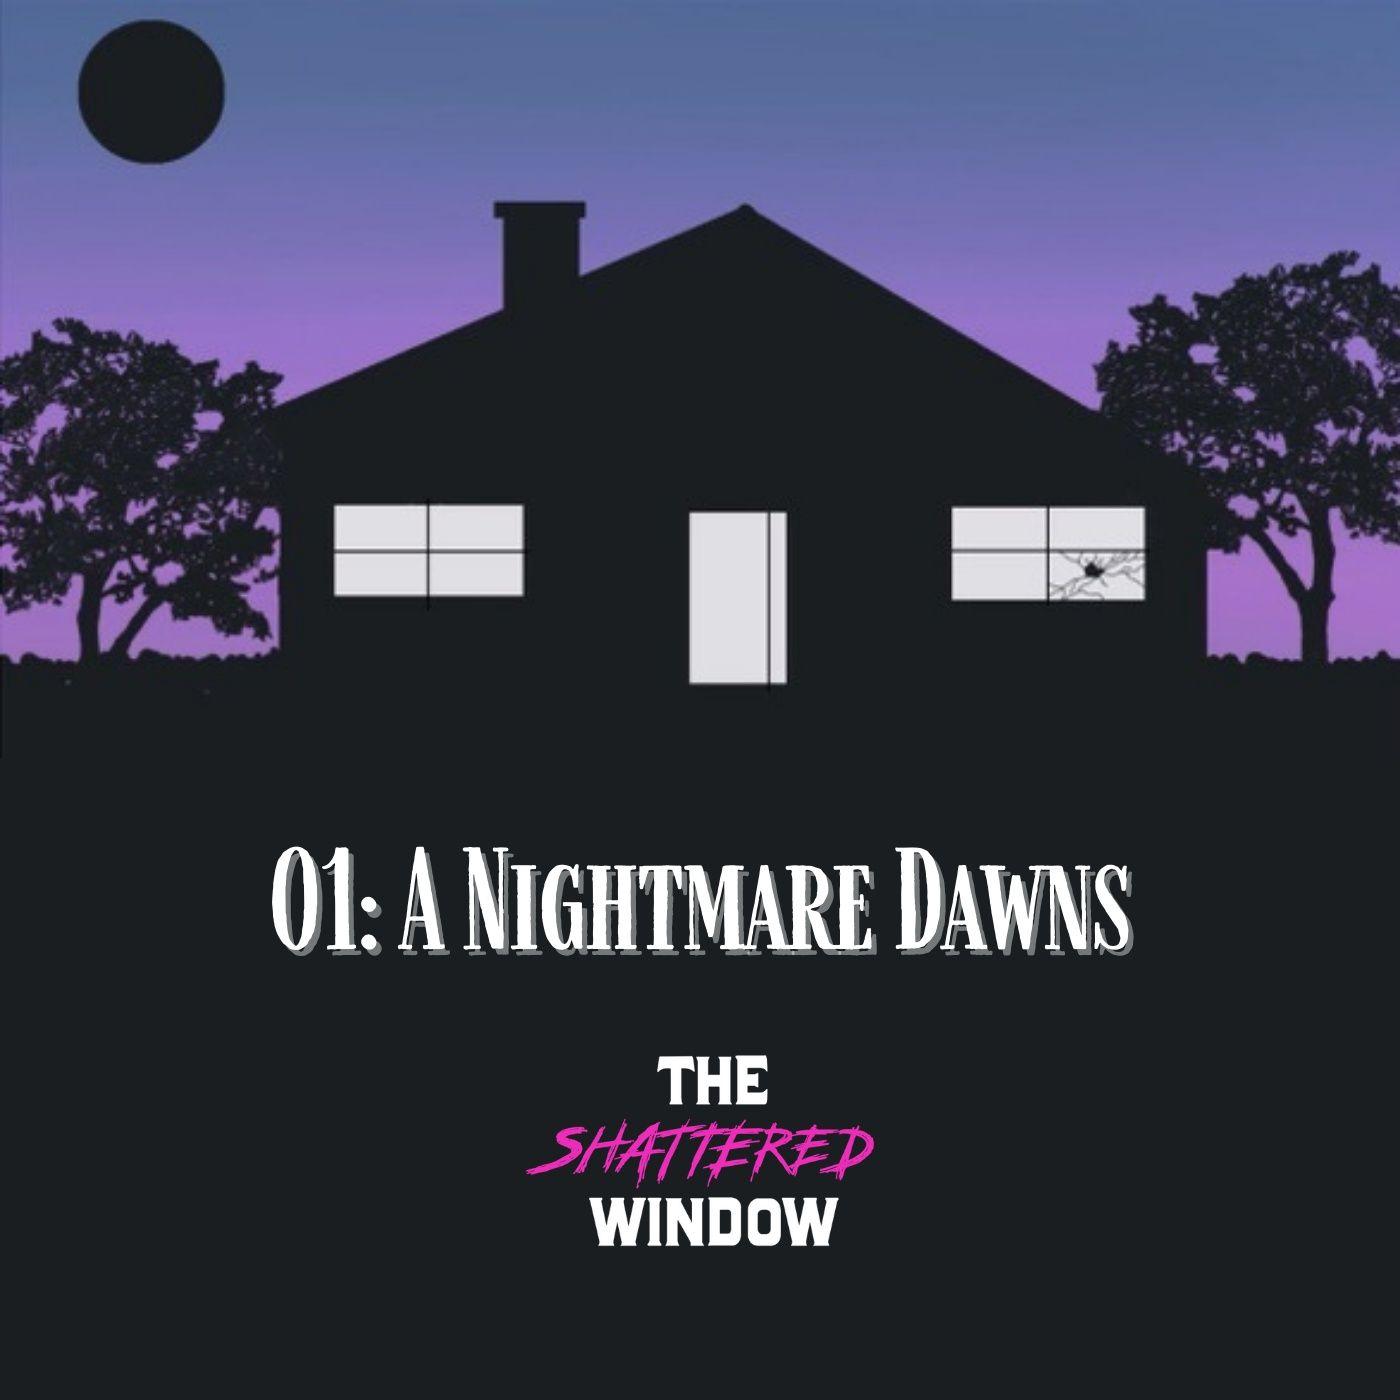 01: A Nightmare Dawns